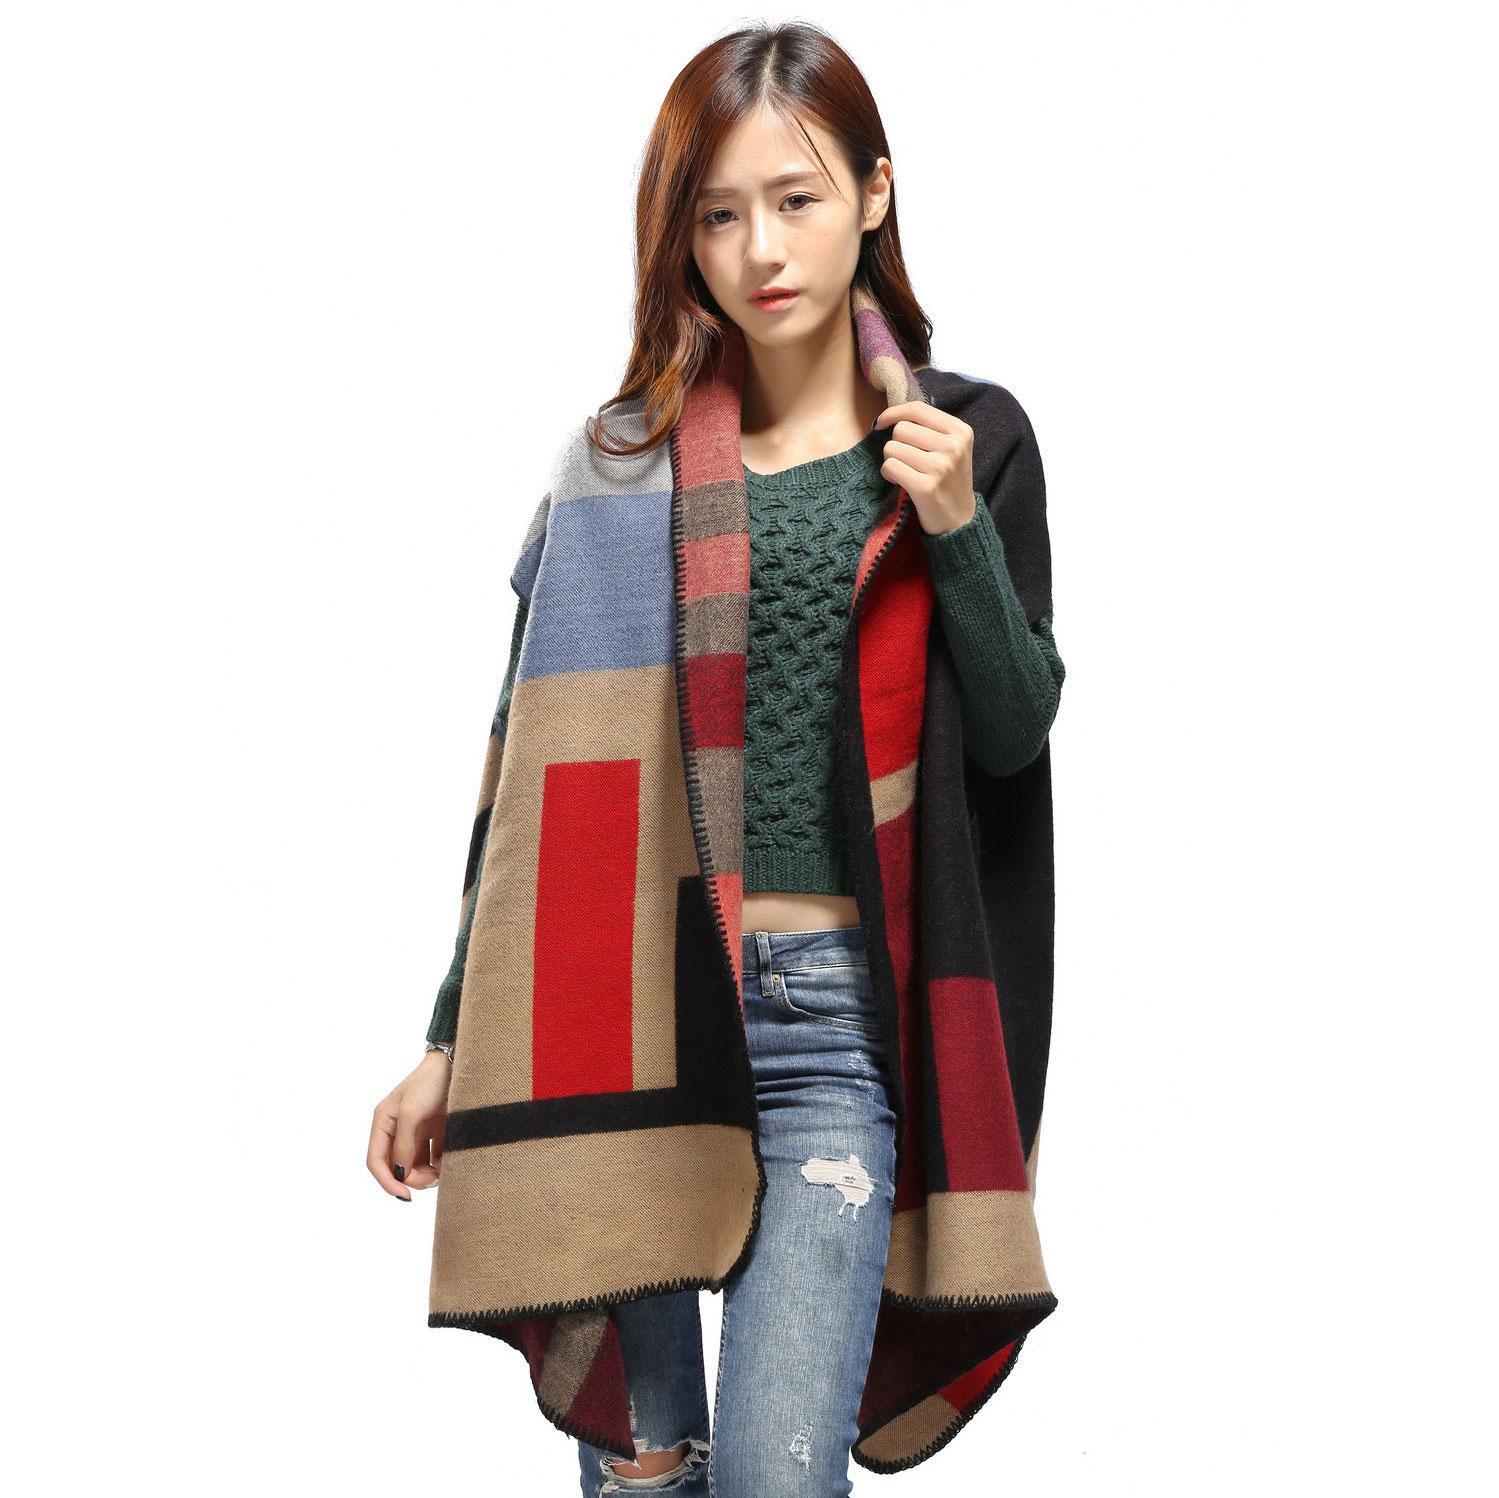 Street Snap 2018 Winter Runway Shawls Womens Plaid Woolen Cape Poncho Jacket Lady Warm Oversized Cardigan Cloak Coat